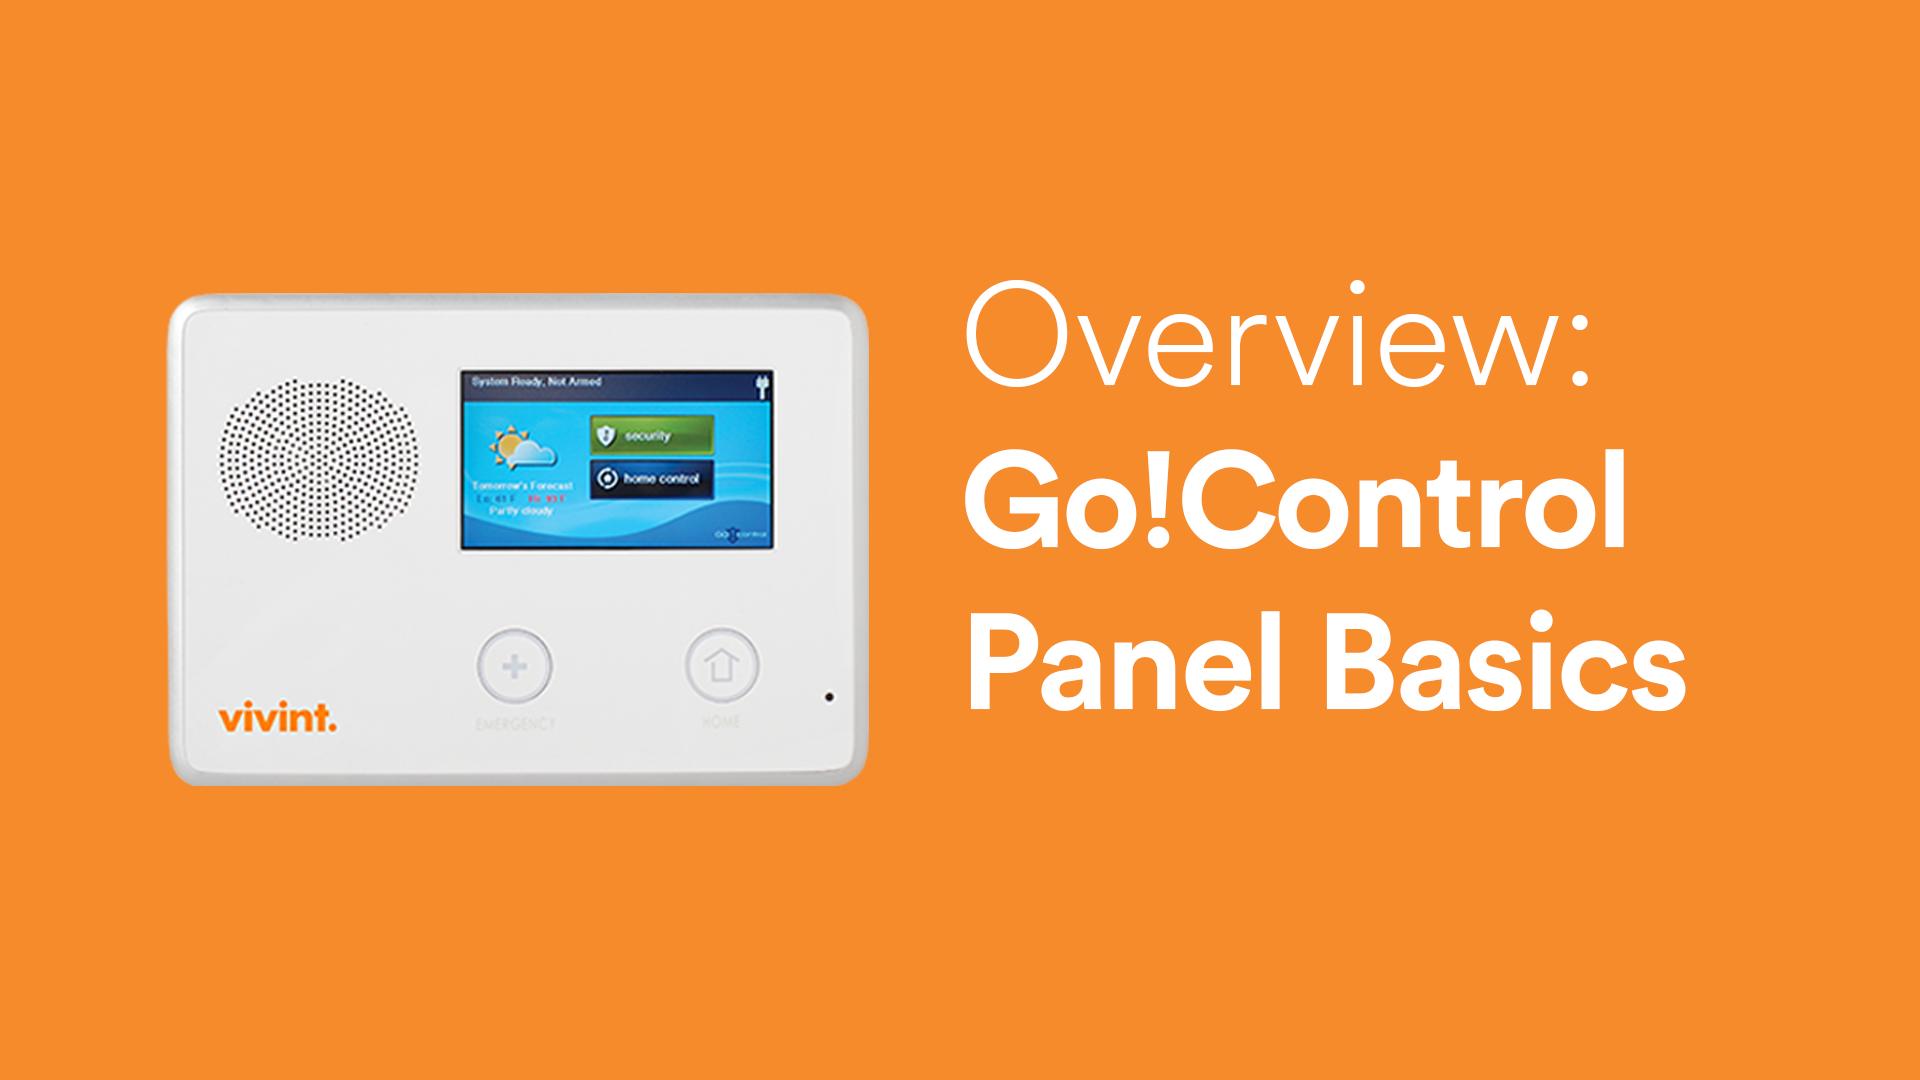 Vivint Go!Control: Panel Basics